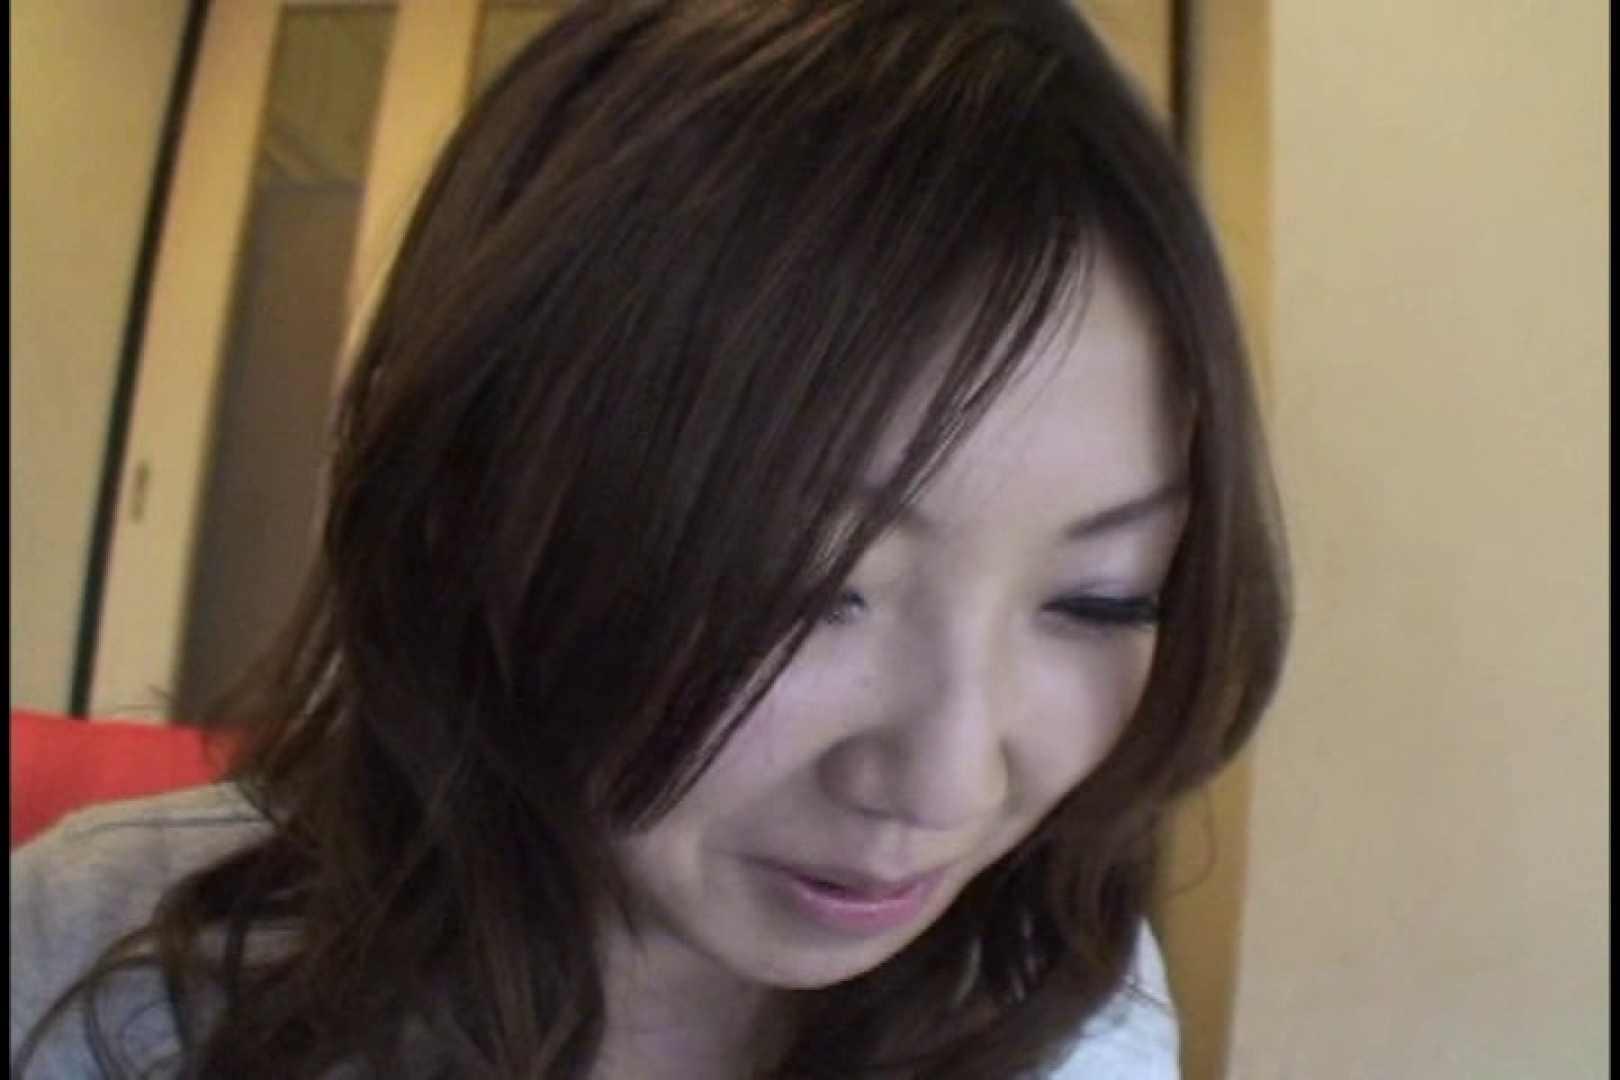 JDハンター全国ツアー vol.041 前編 女子大生のエロ動画  85PIX 24